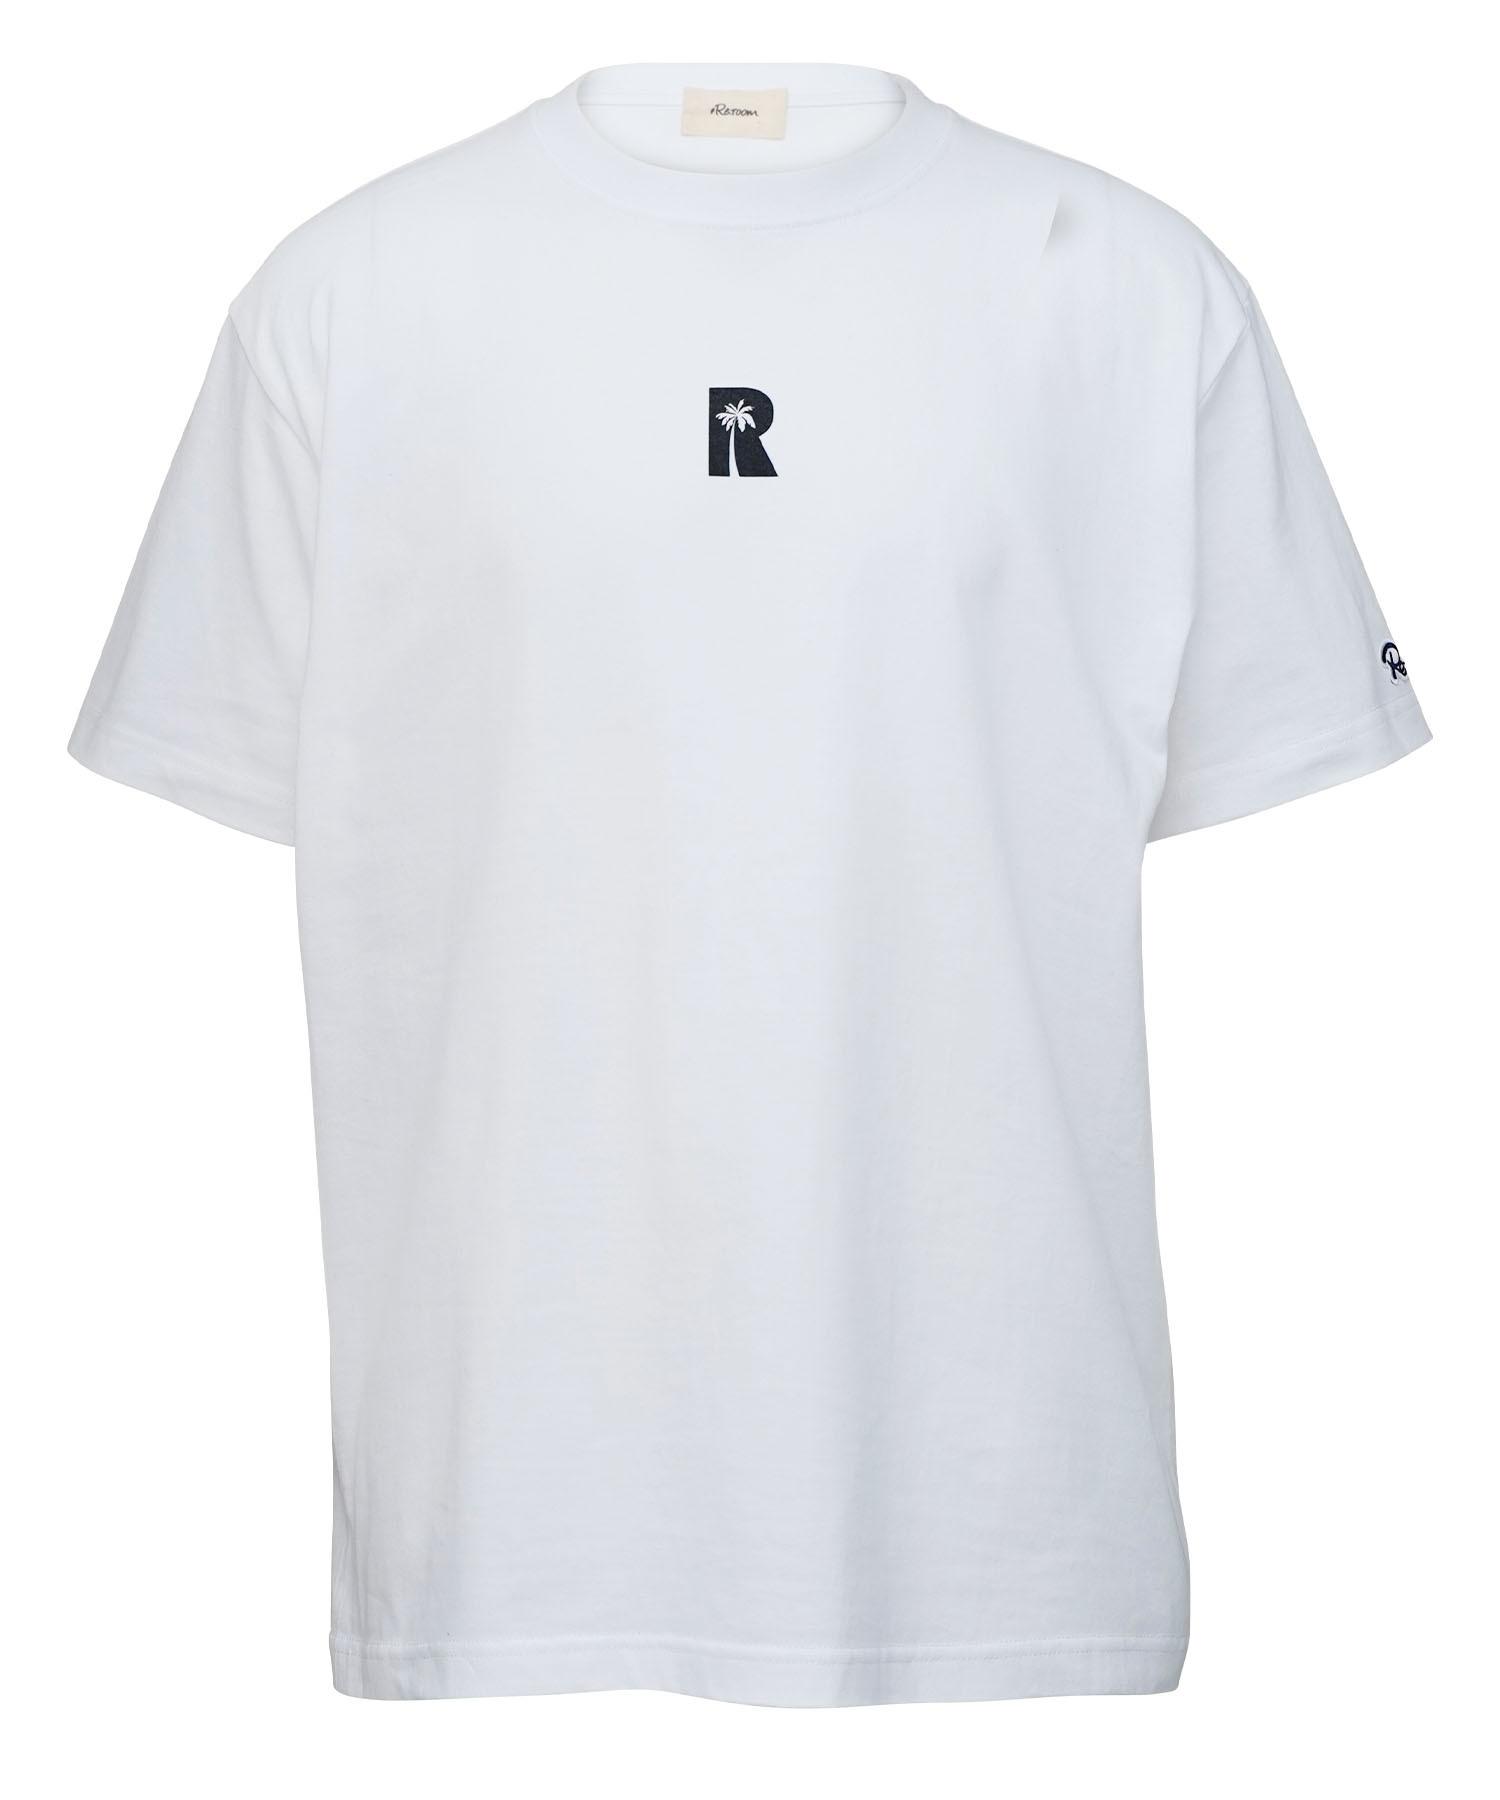 R SILHOUETTE GRAPHIC PRINT T-shirt[REC510]